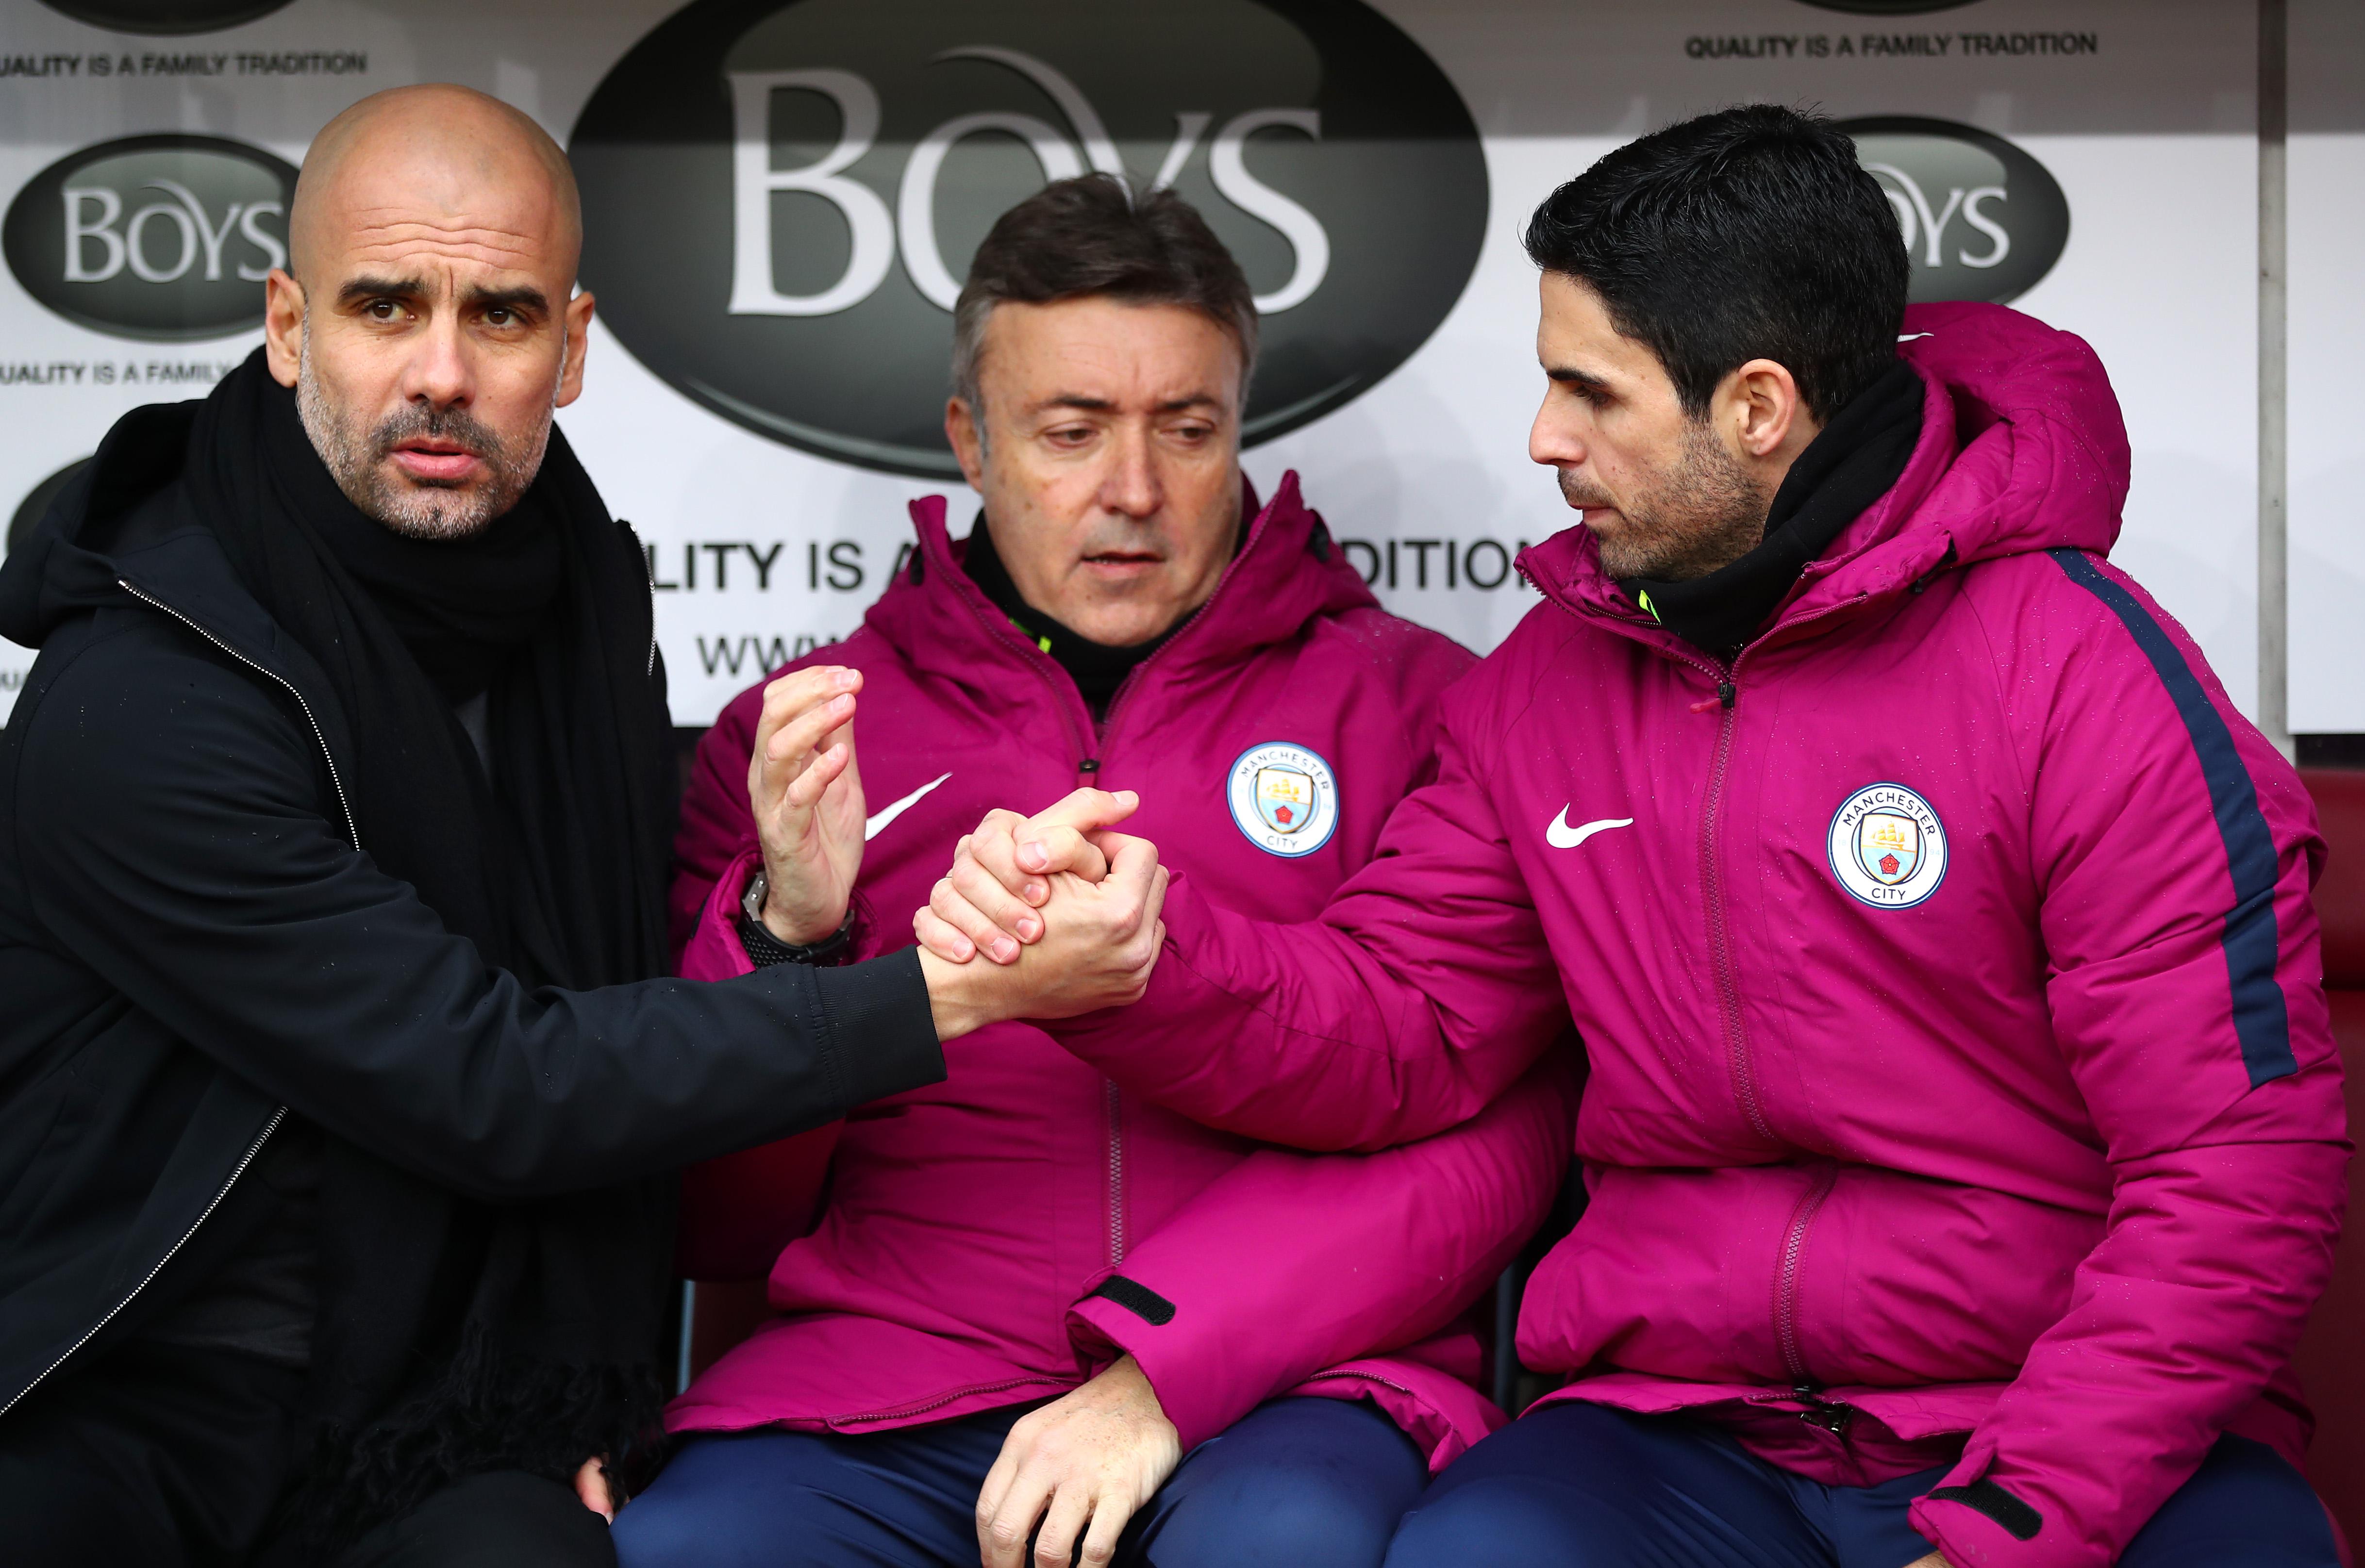 Burnley boss Sean Dyche: Fans fantastic for Man City draw